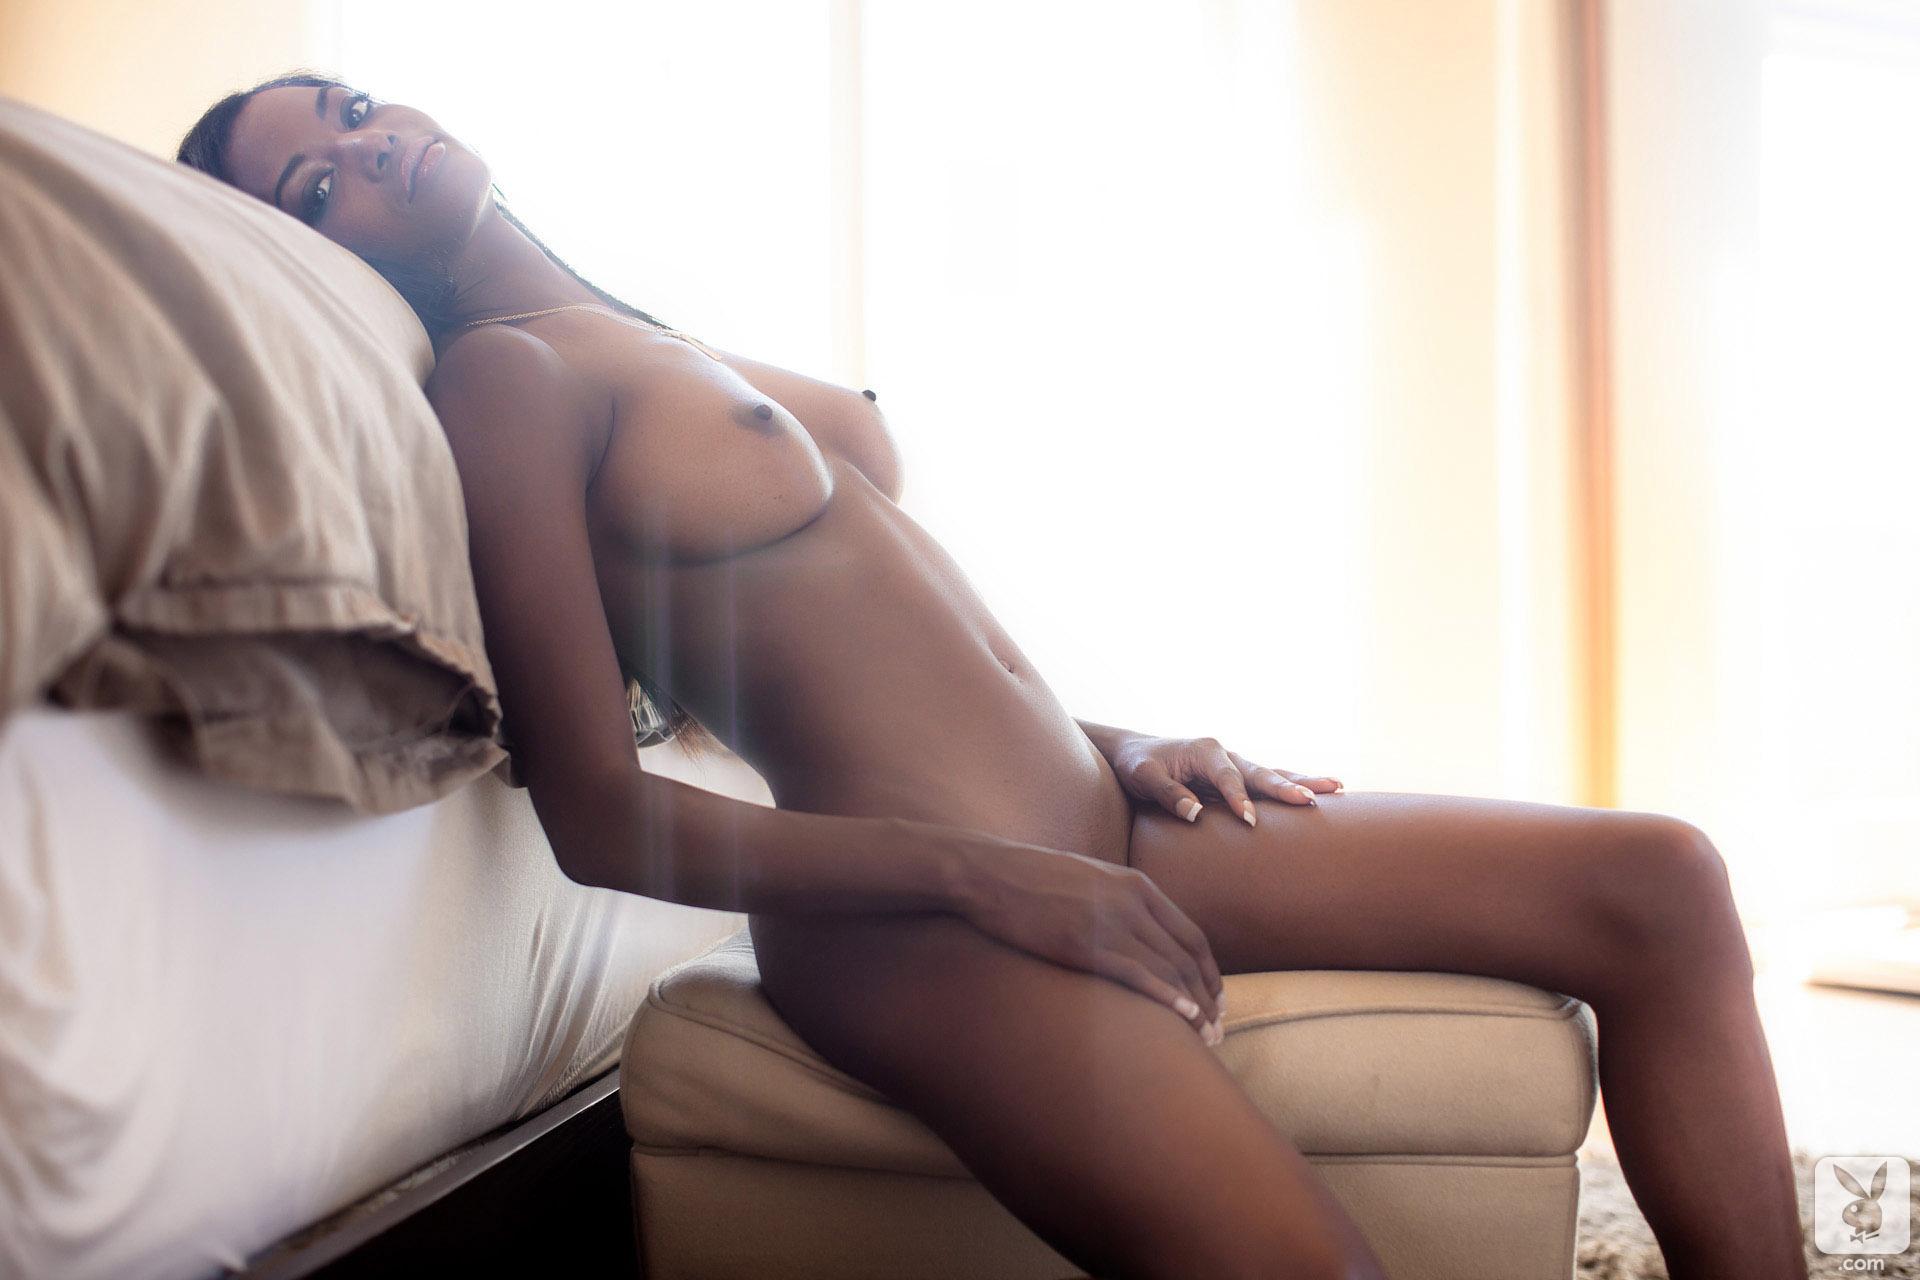 danielle-nicole-naked-ebony-rooftop-honey-bikini-playboy-24